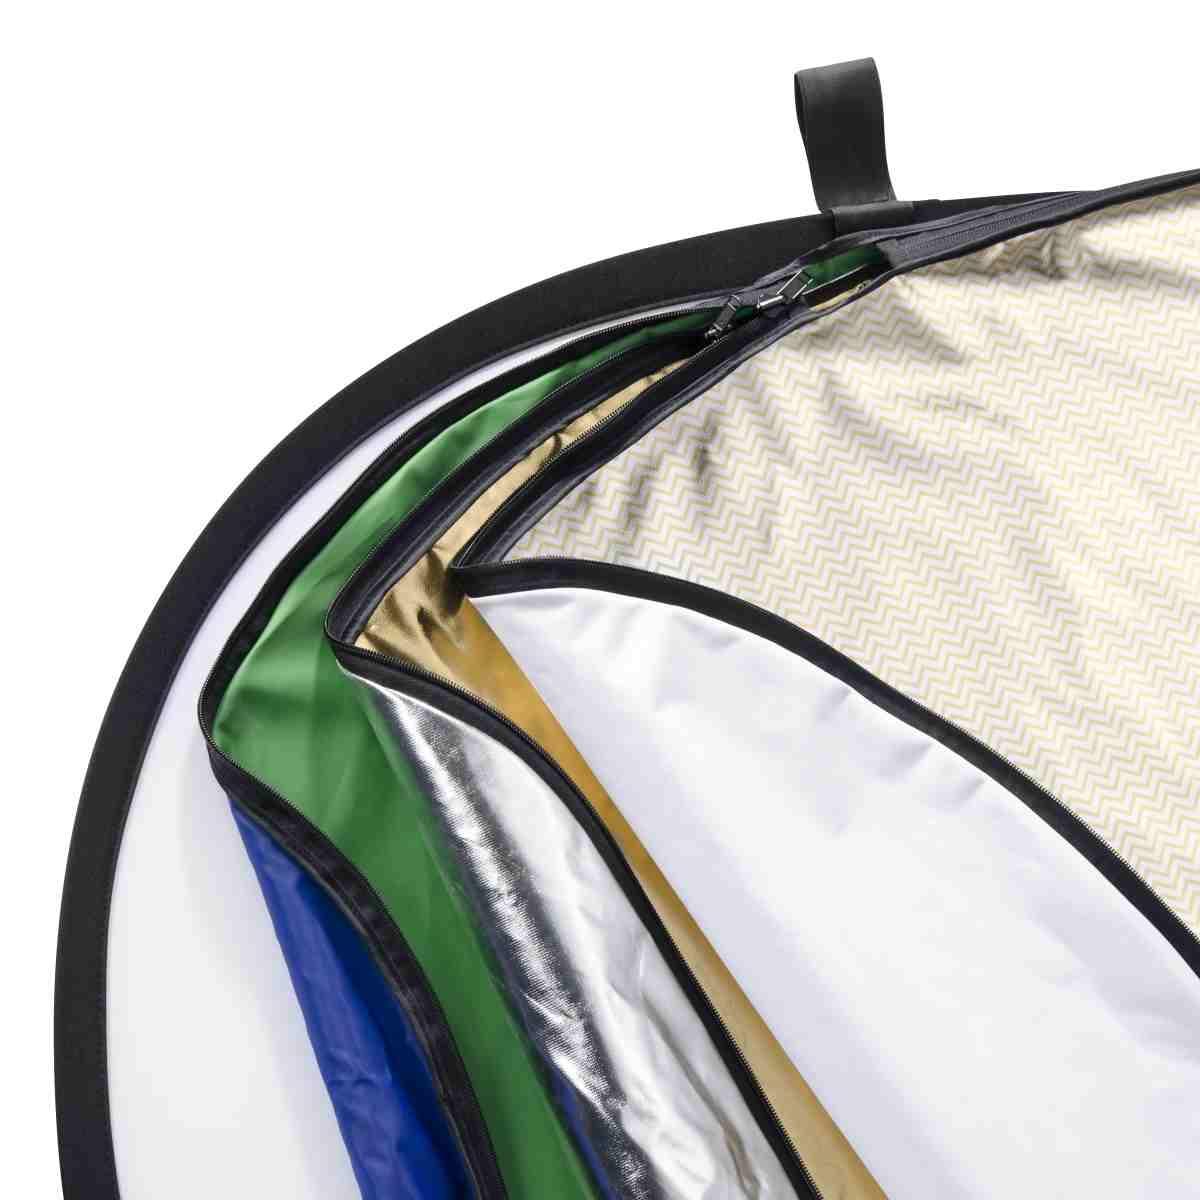 Walimex 7in1 Foldable Reflector Set, 102x168cm